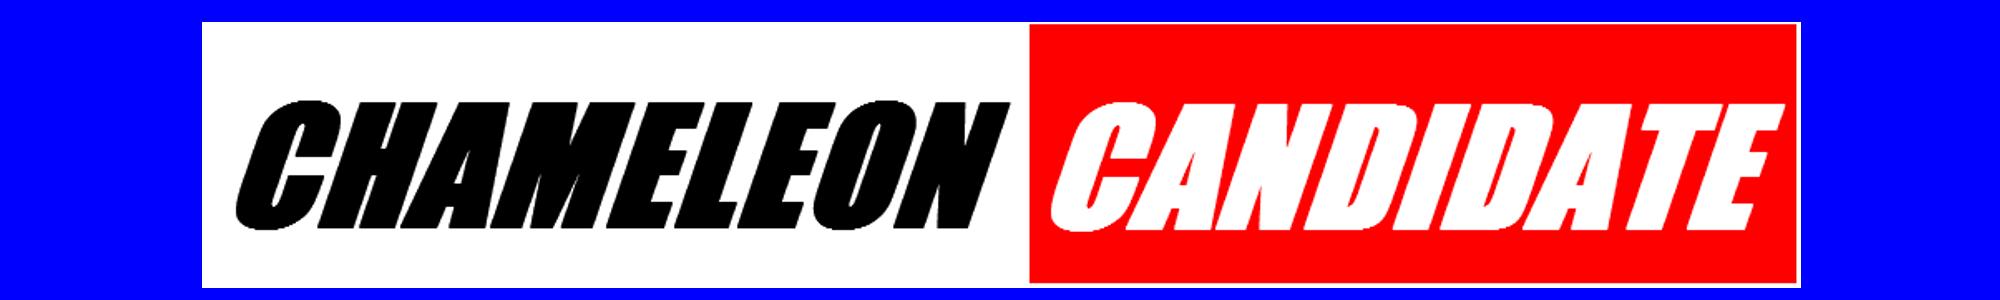 Chameleon Candidate - LD 35 Entry